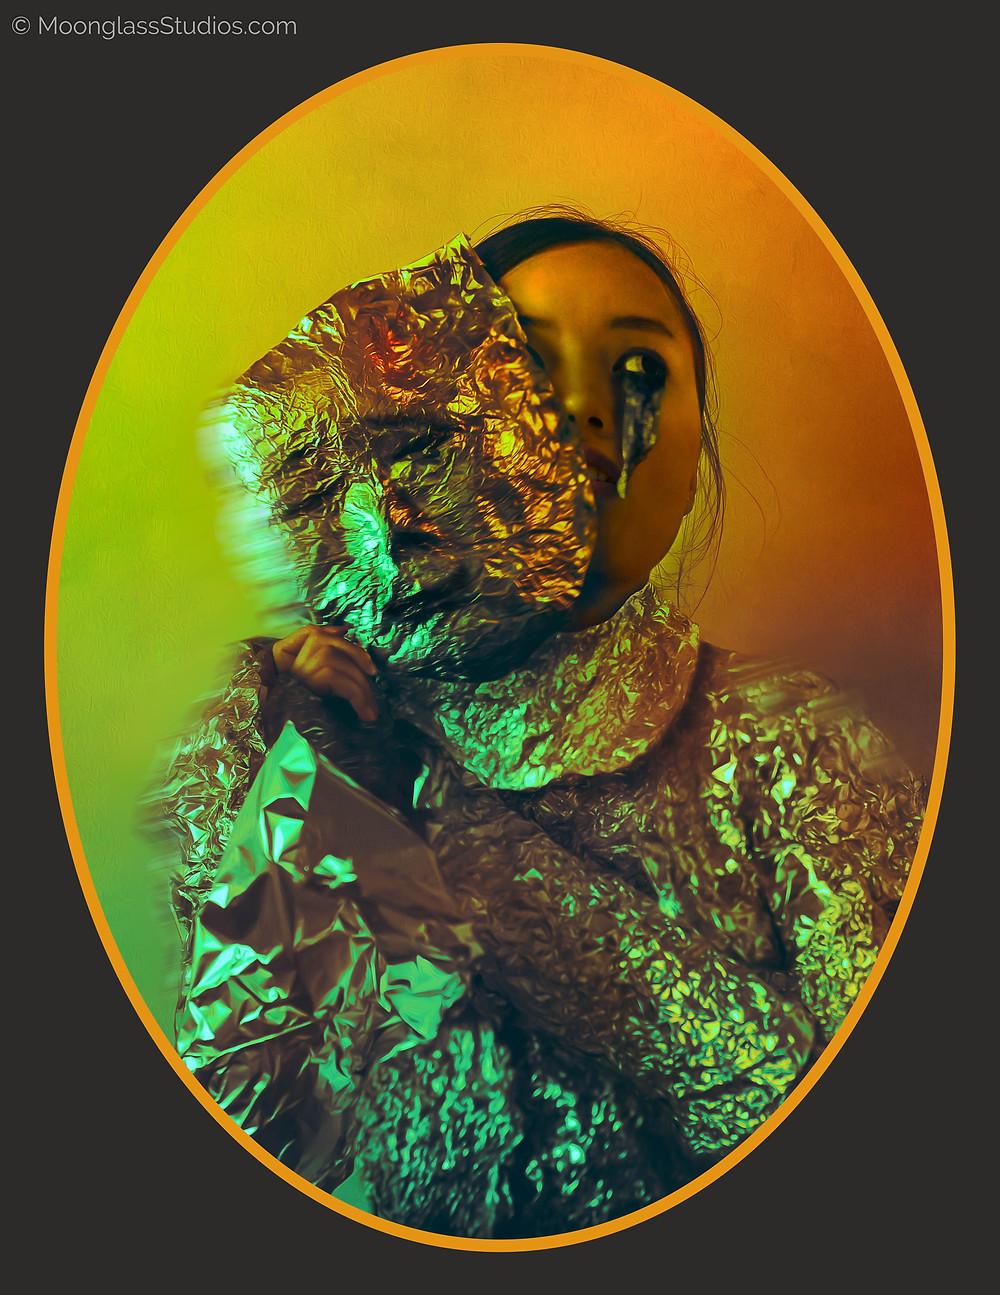 Masked Malady by Diana Chao